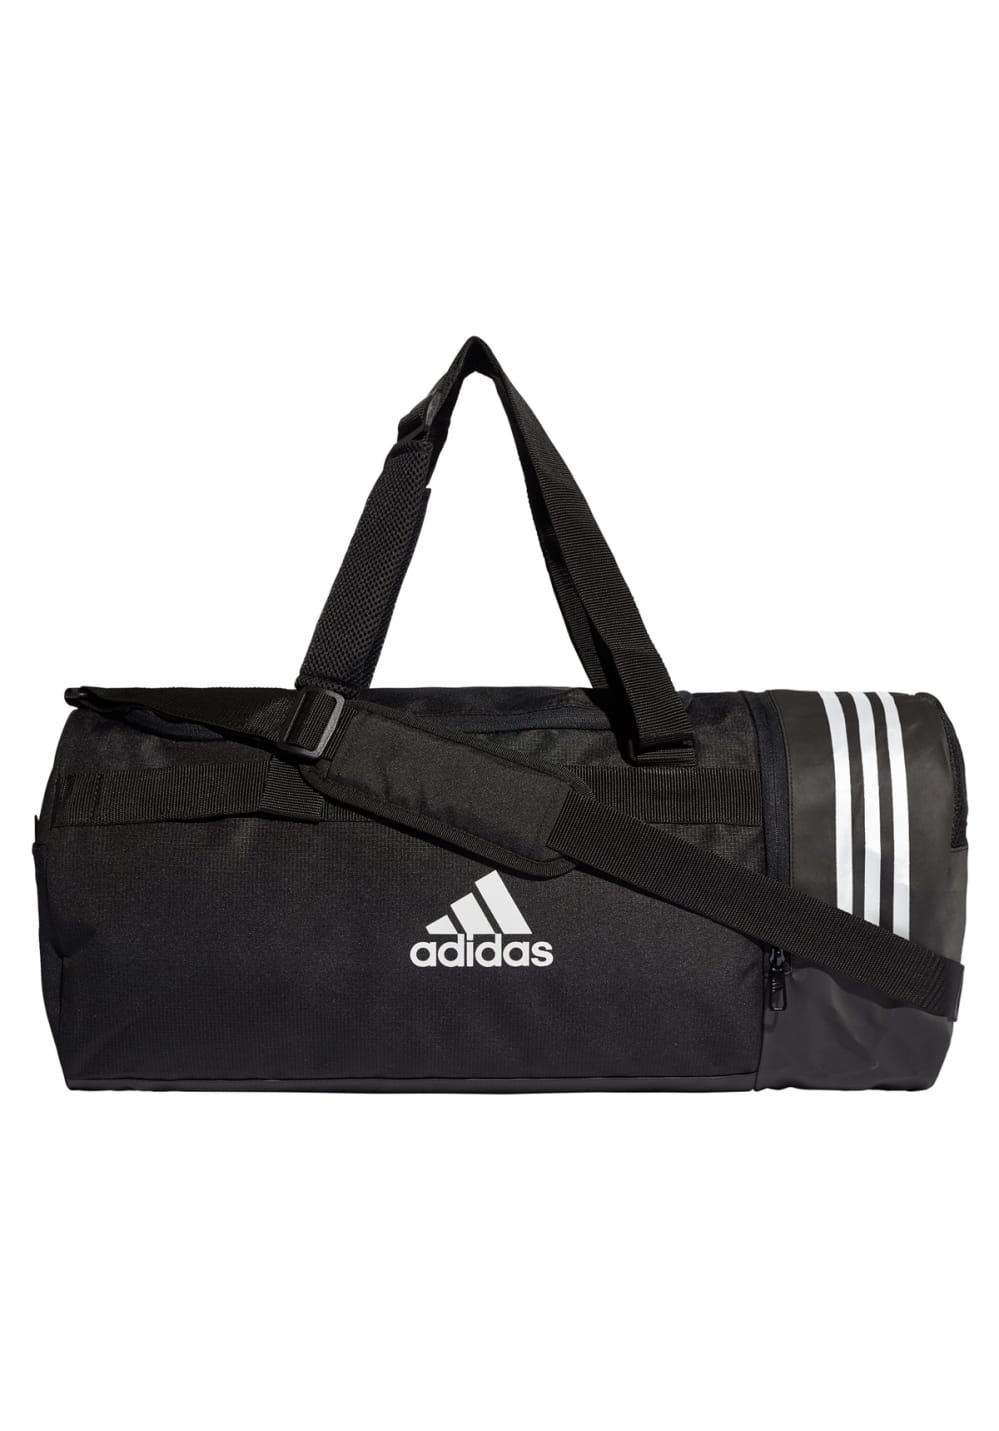 adidas Convertible 3-Stripes Duffel Bag Medium Sporttaschen - Schwarz